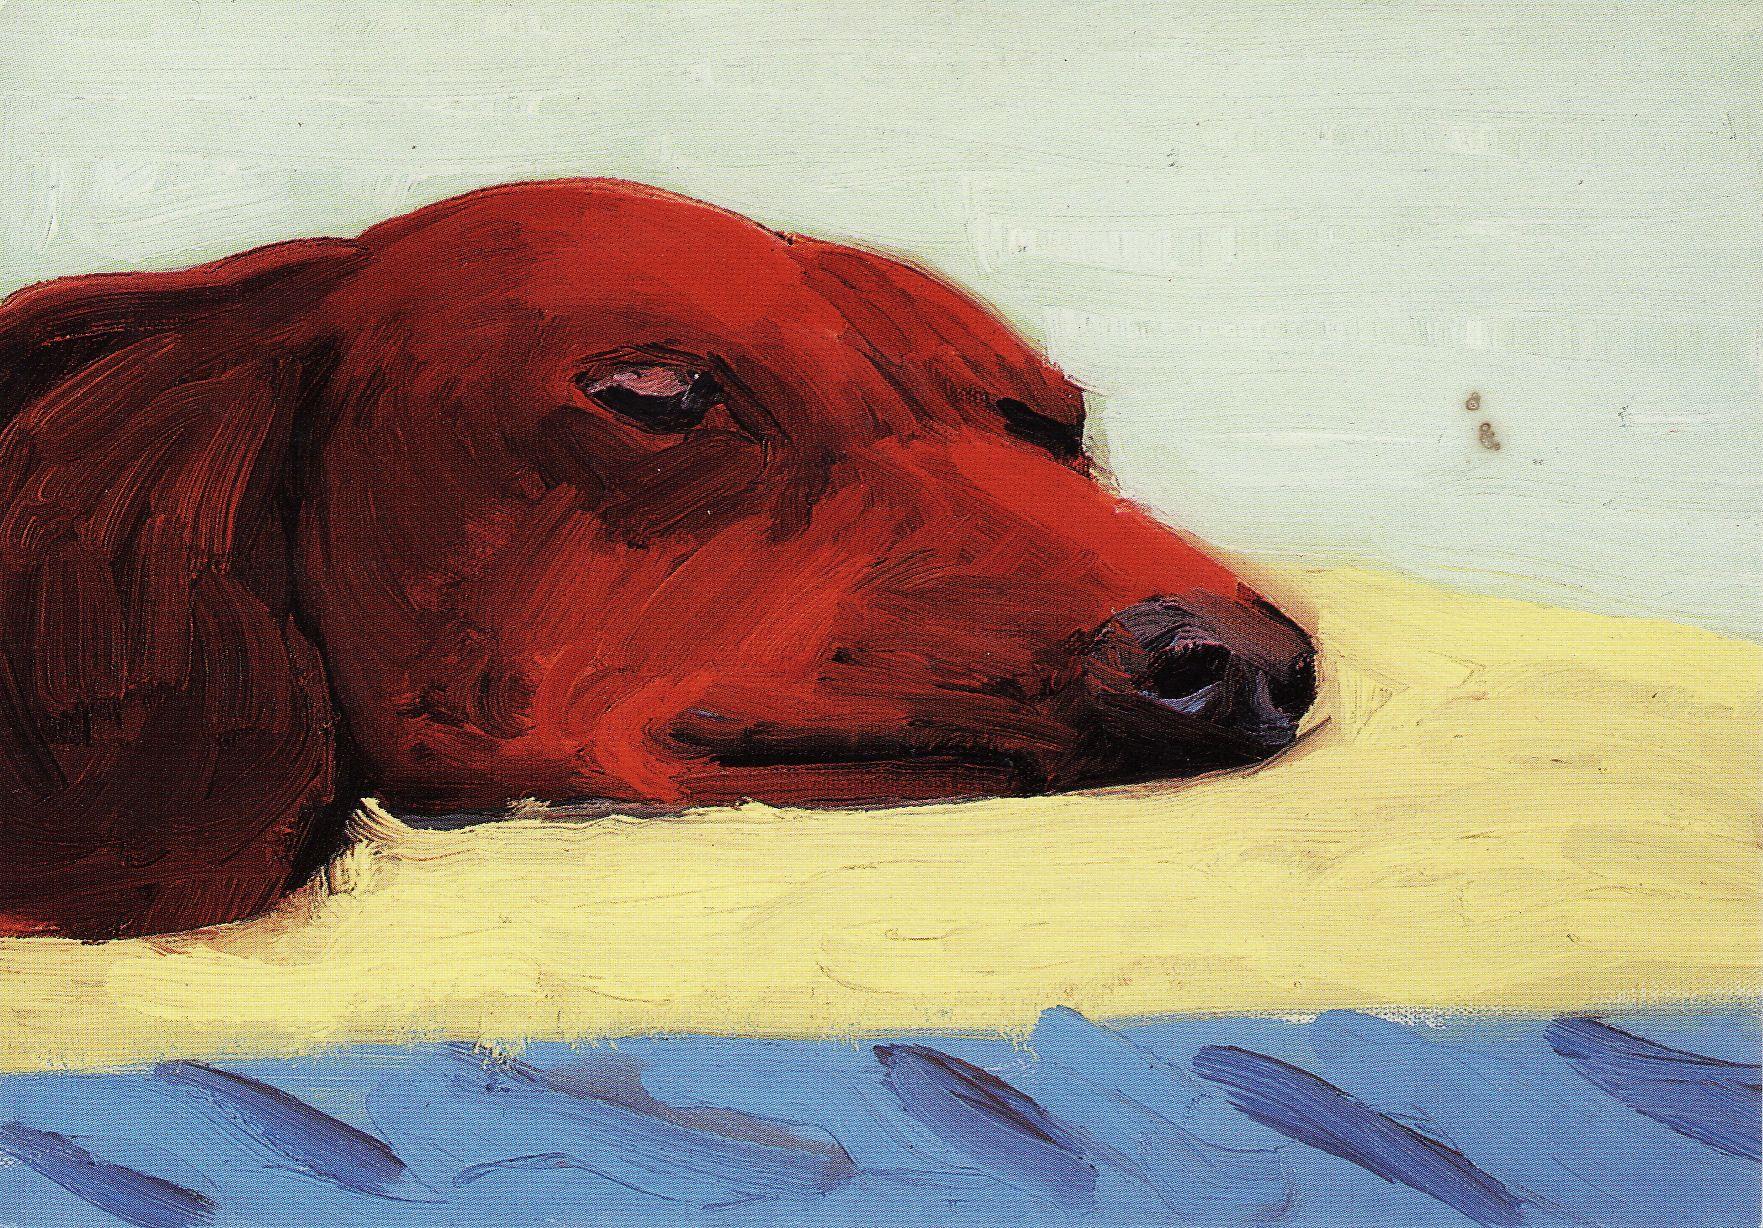 david hockney dog painting ipad art in 2018 pinterest